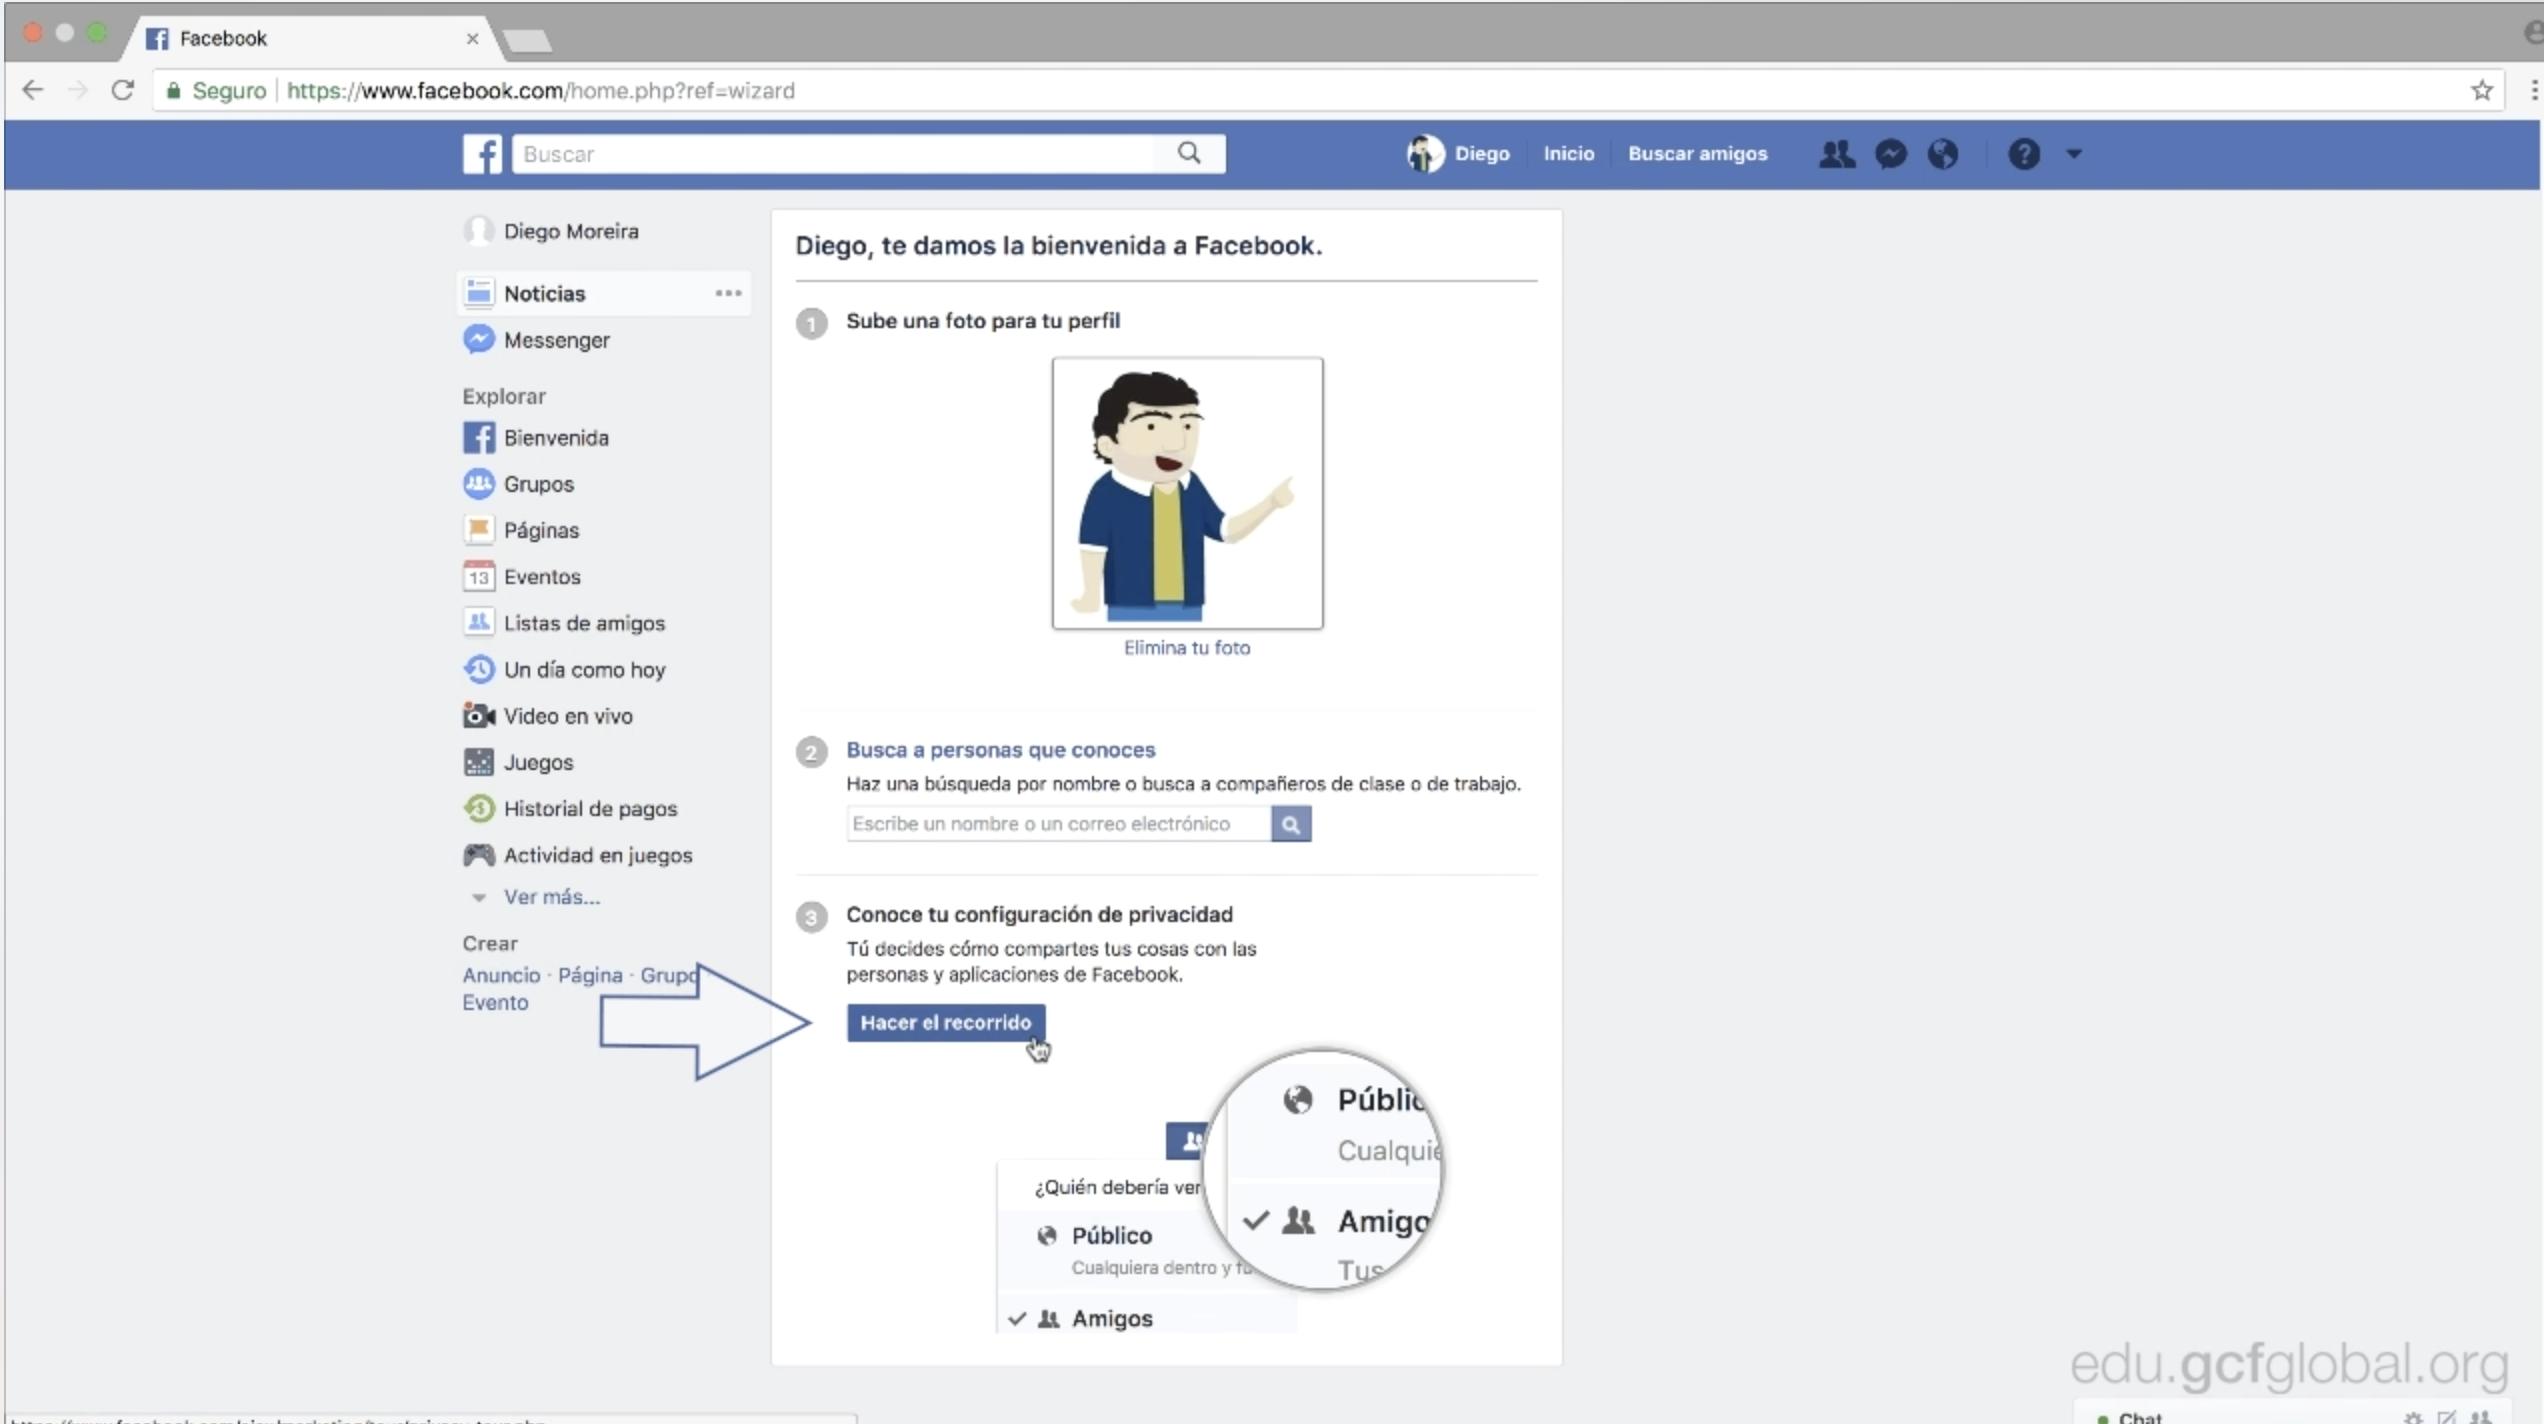 Crear Cuenta Gmail Para Facebook Gratis ✓ The GMC Car